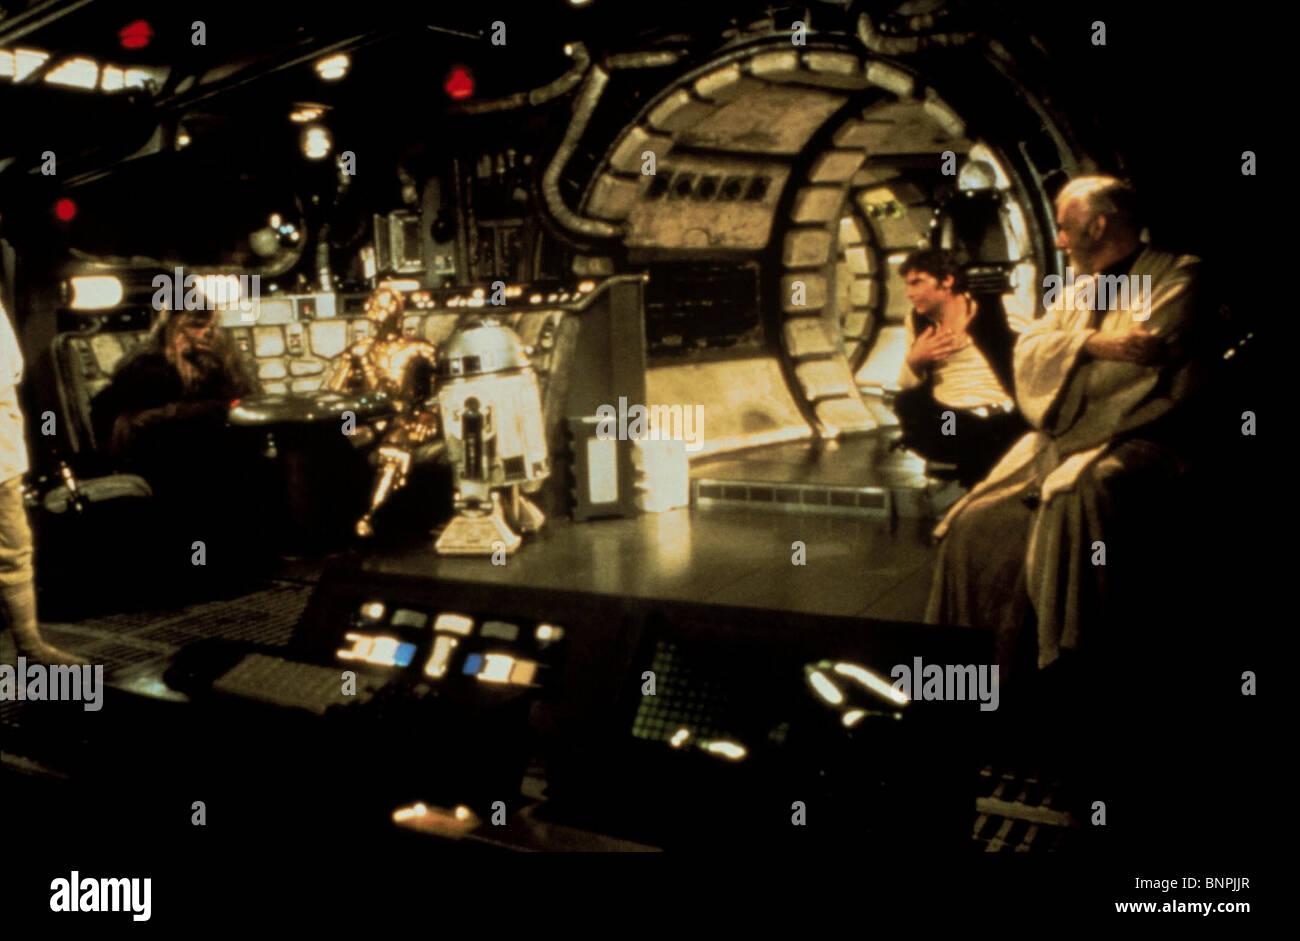 star wars episode 8 harrison ford